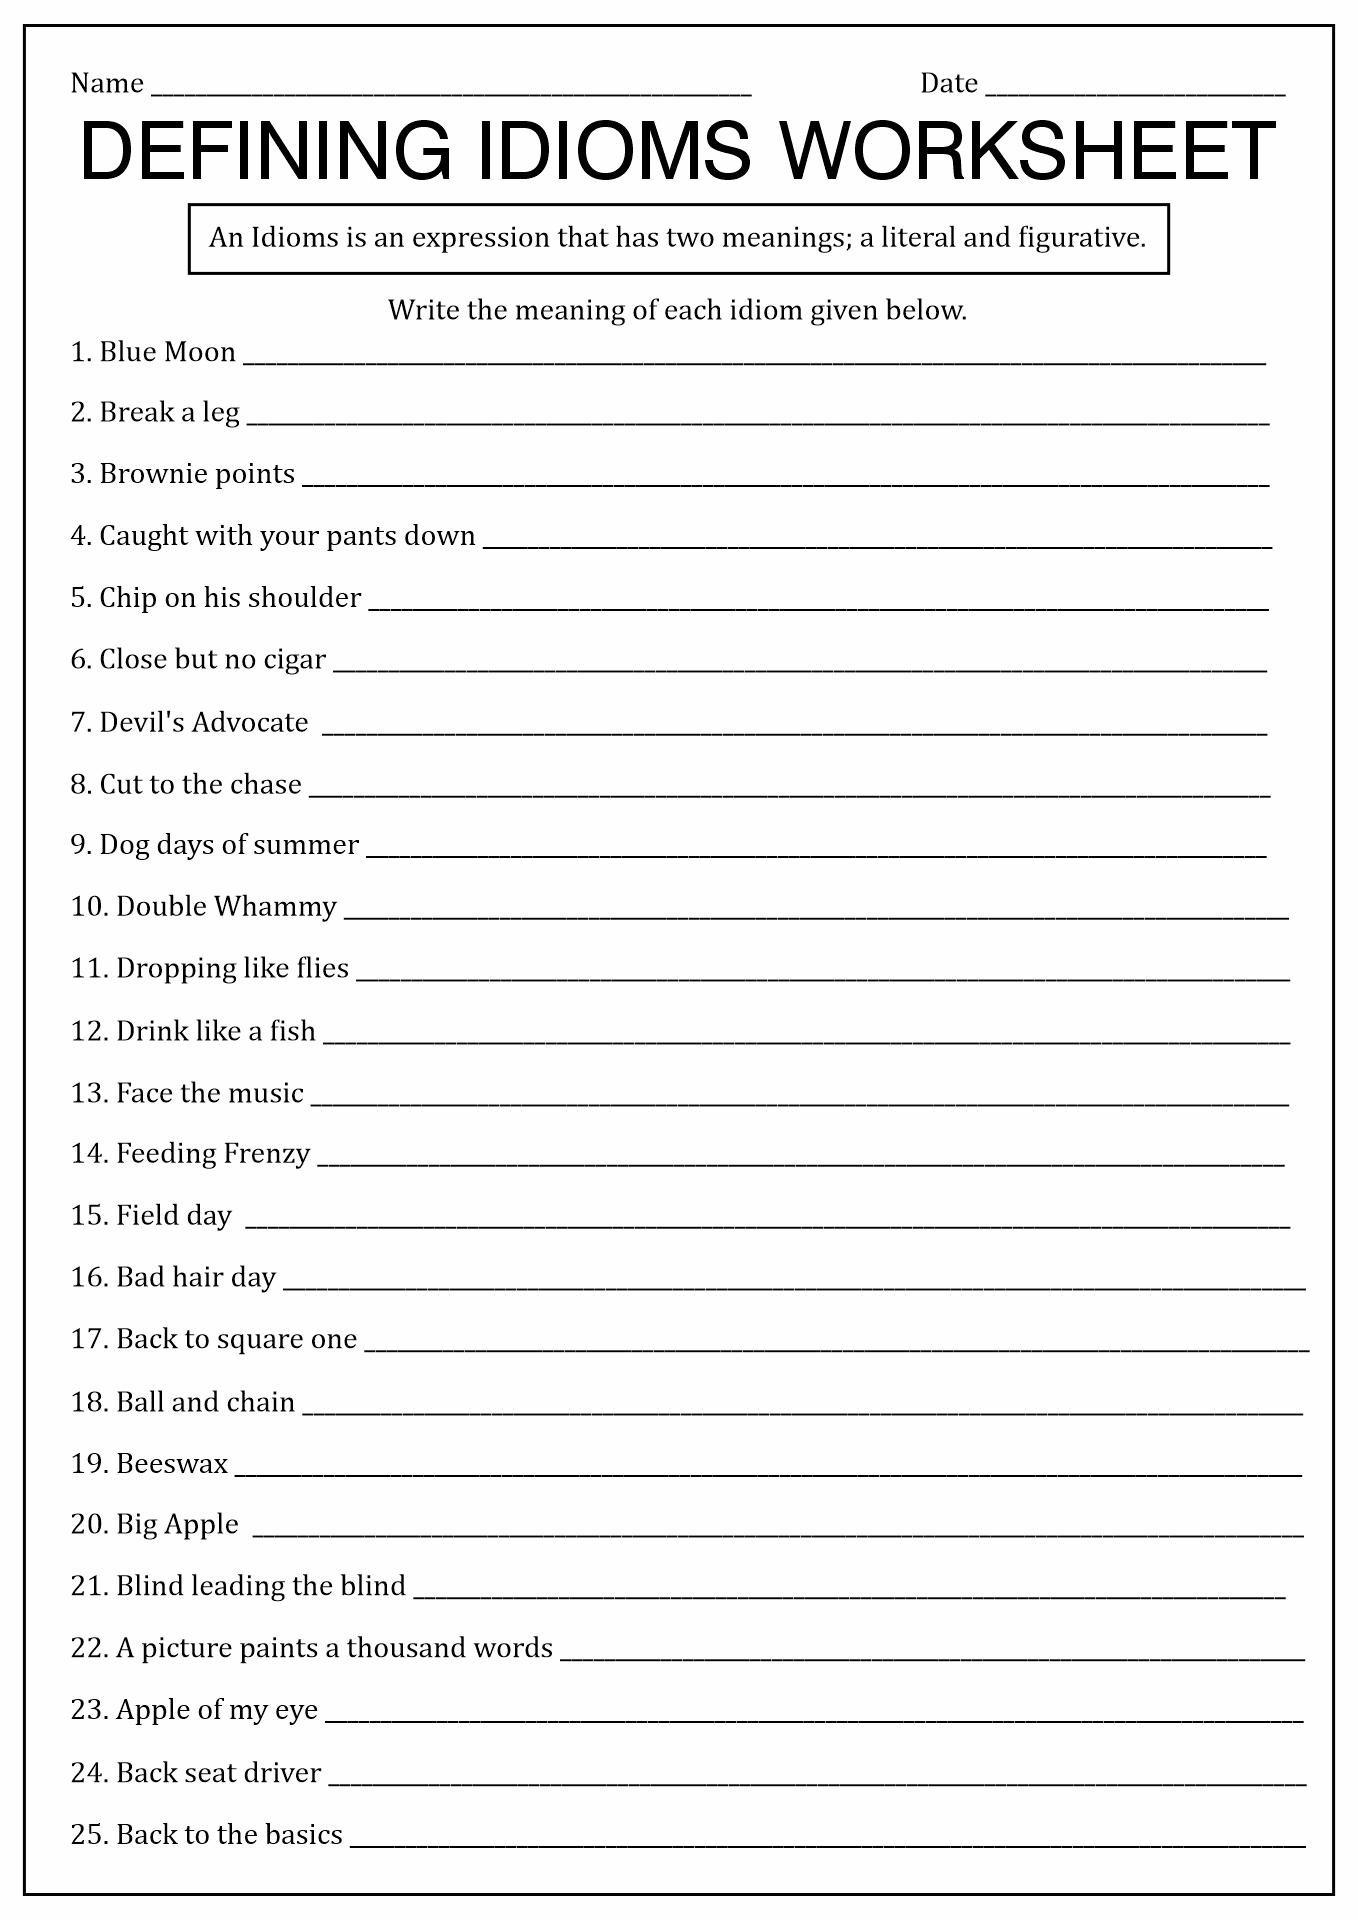 Idioms Worksheet Middle School